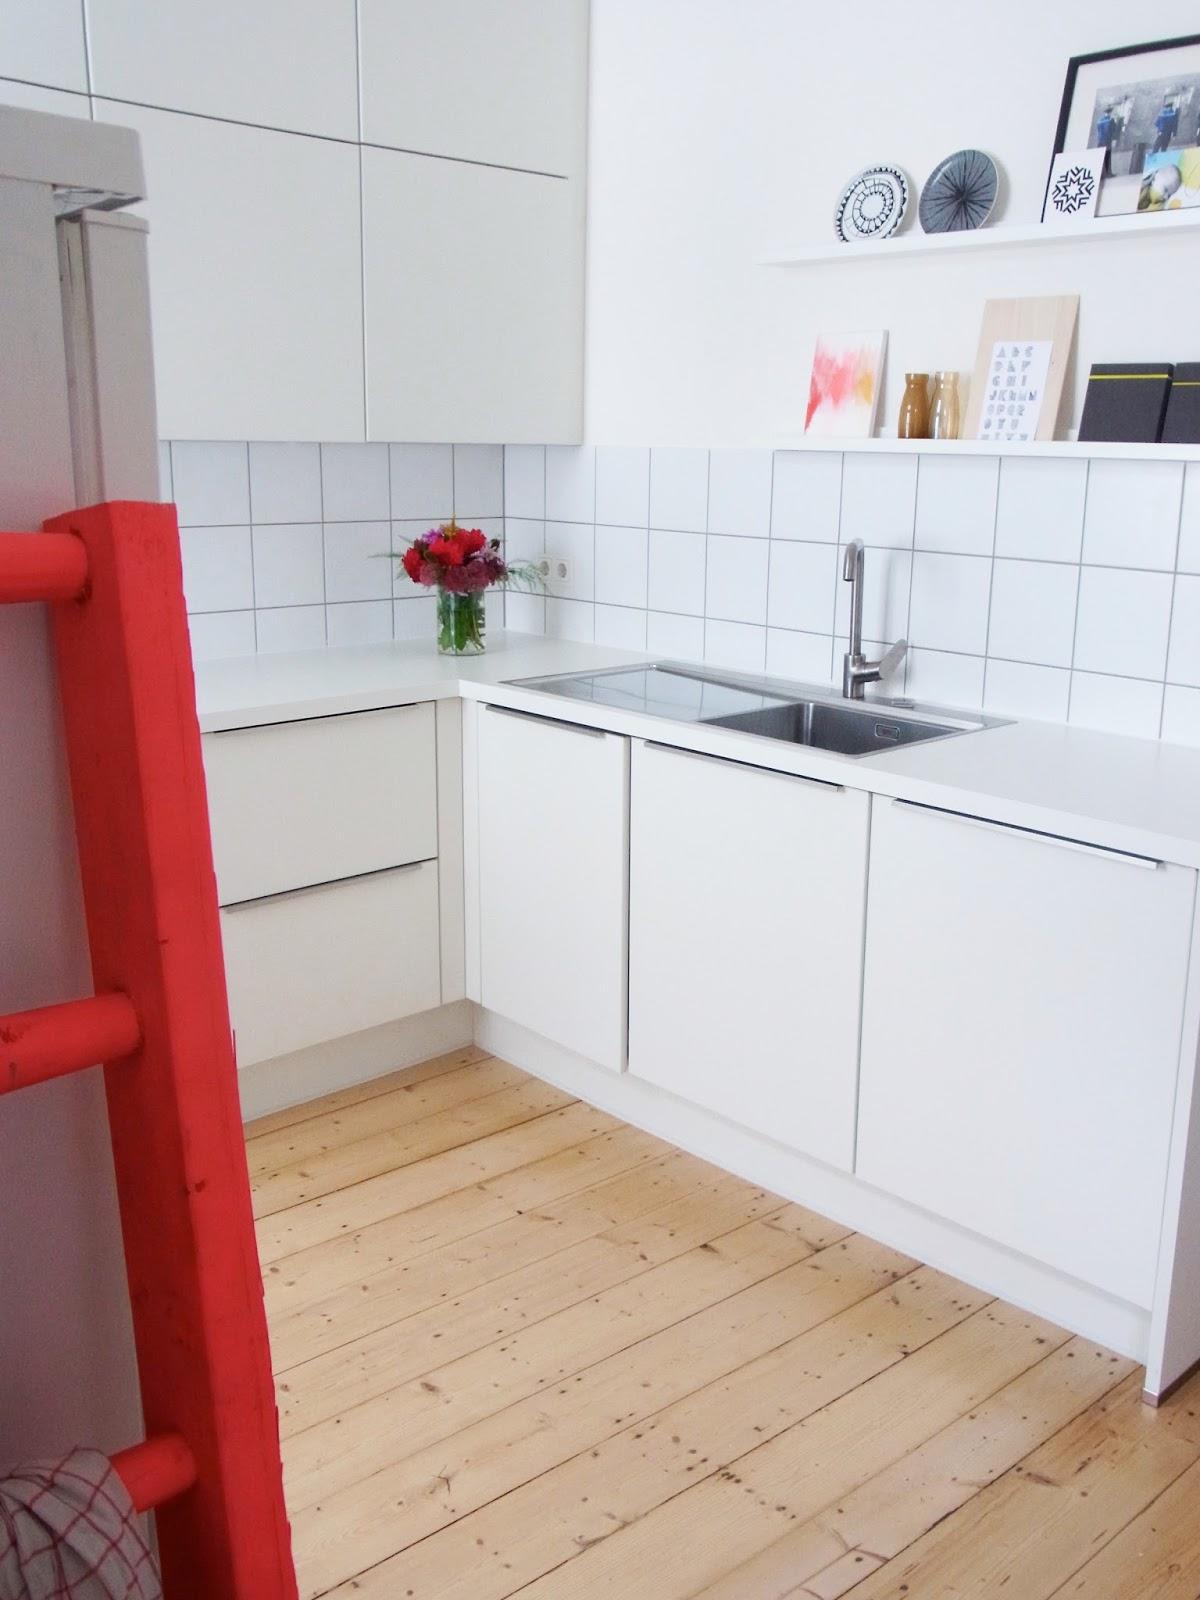 Kvik: Home sweet Home: Unsere Küche